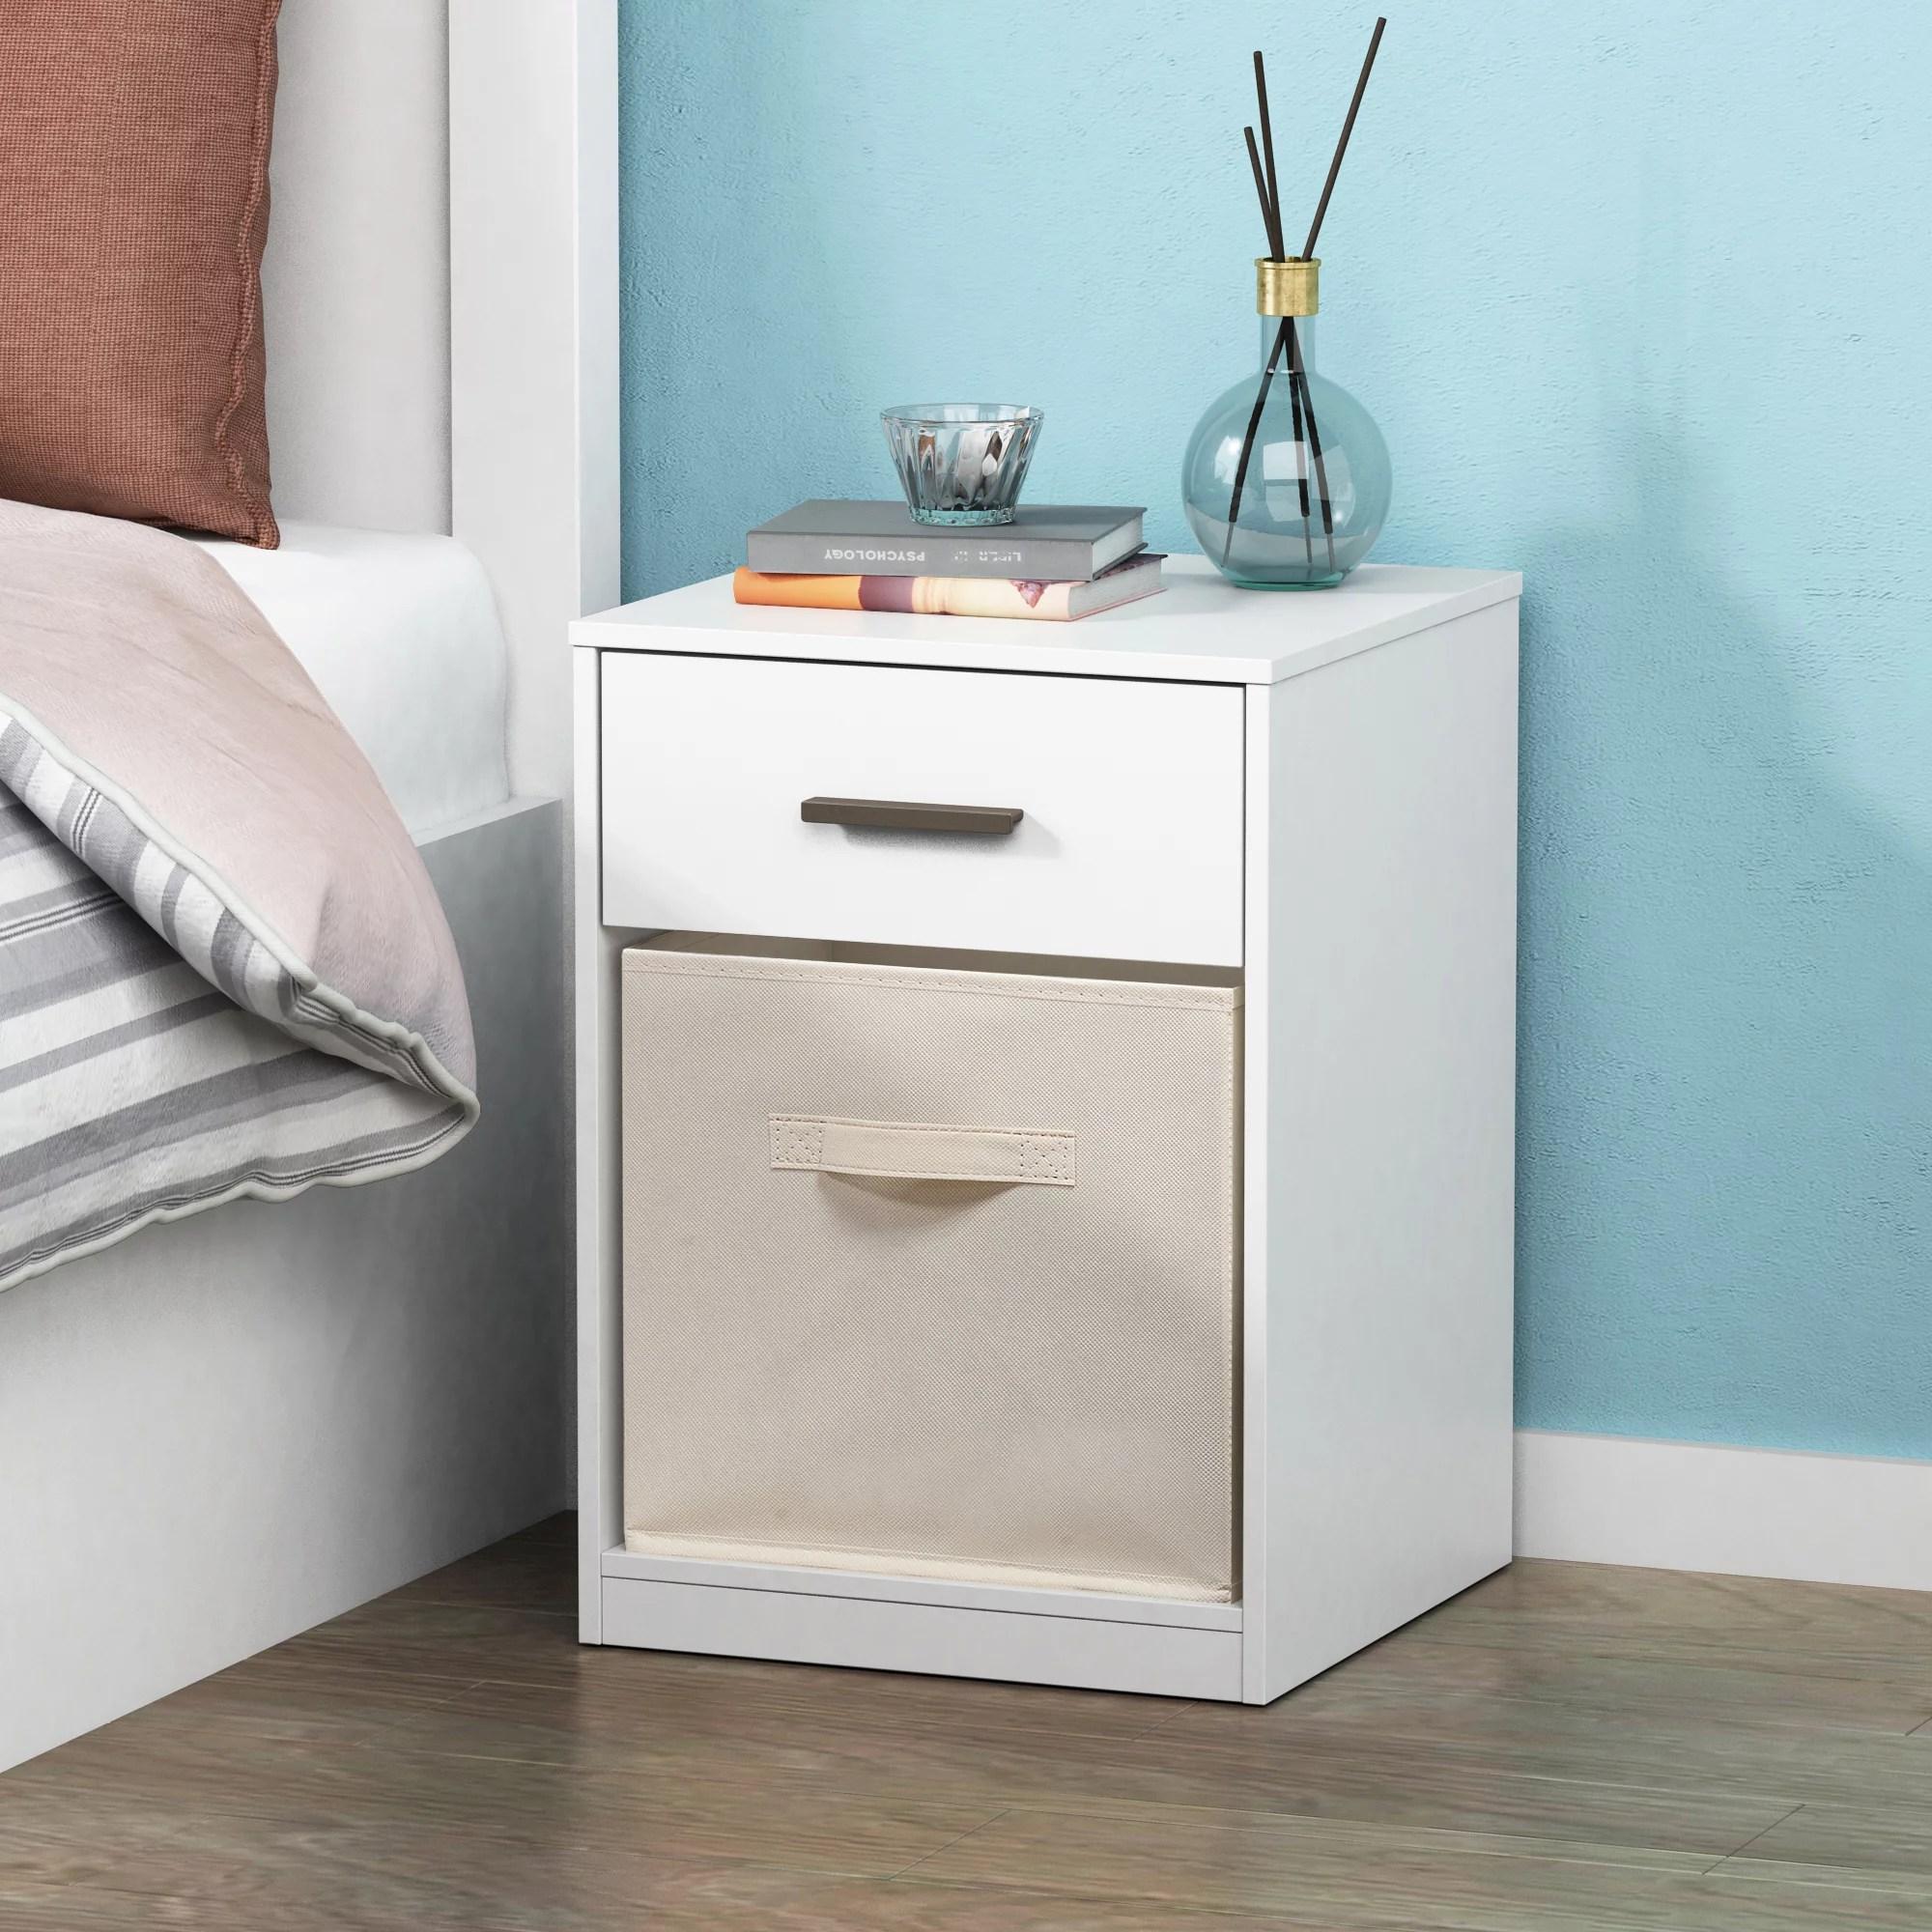 mainstays 1 drawer night stand with cube storage white finish